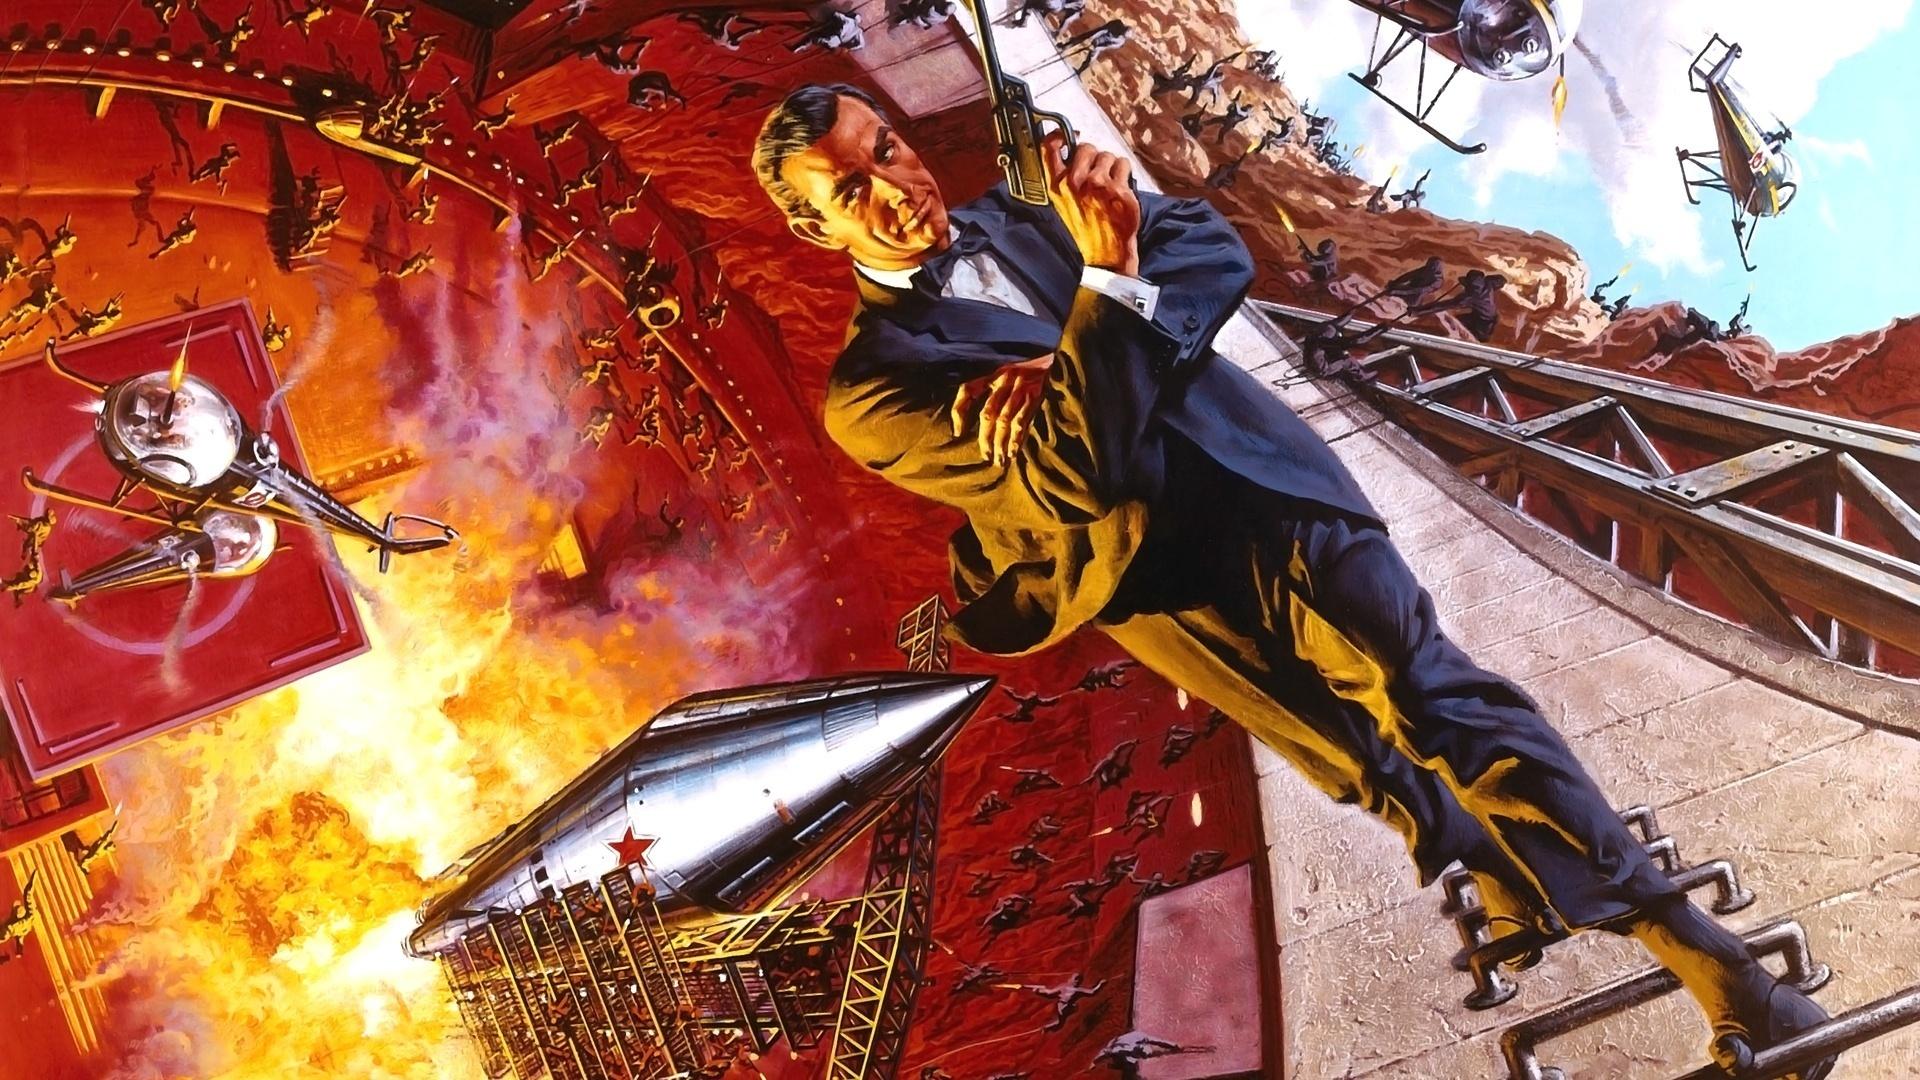 James Bond 007 Skyfall Wallpaper Pack  Download  CHIP